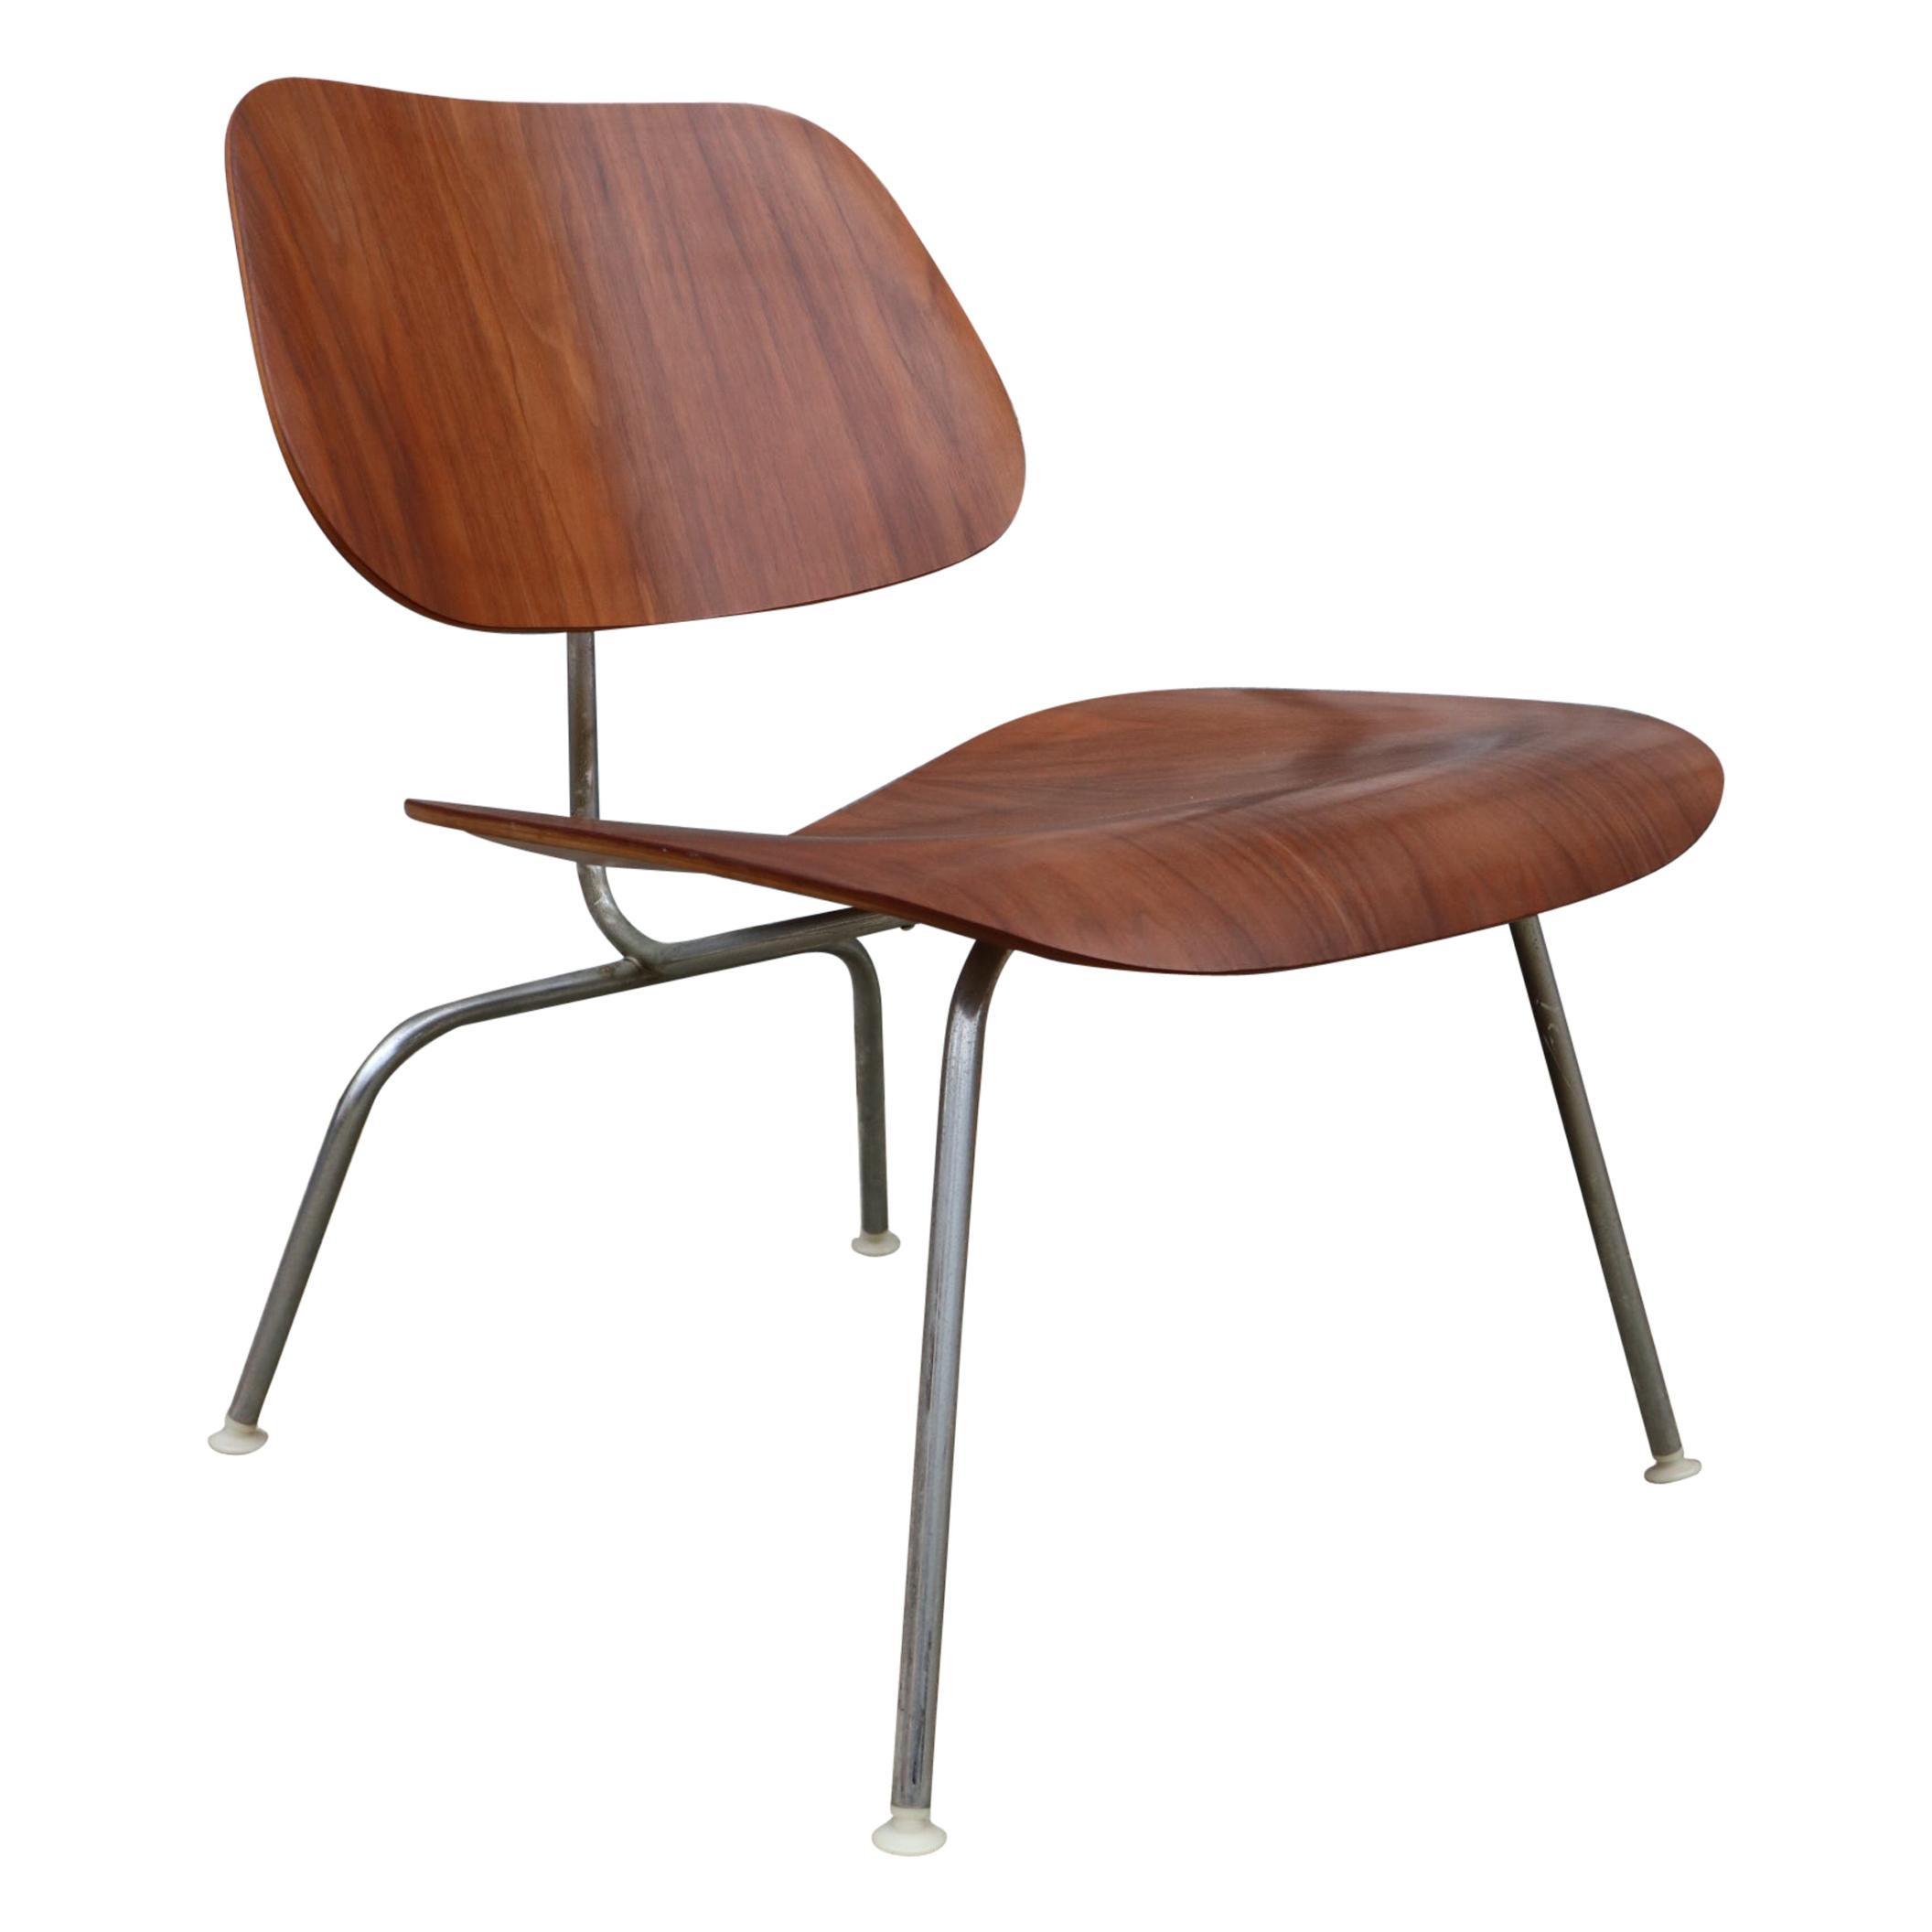 Herman Miller Eames LCM Lounge Chair in Walnut